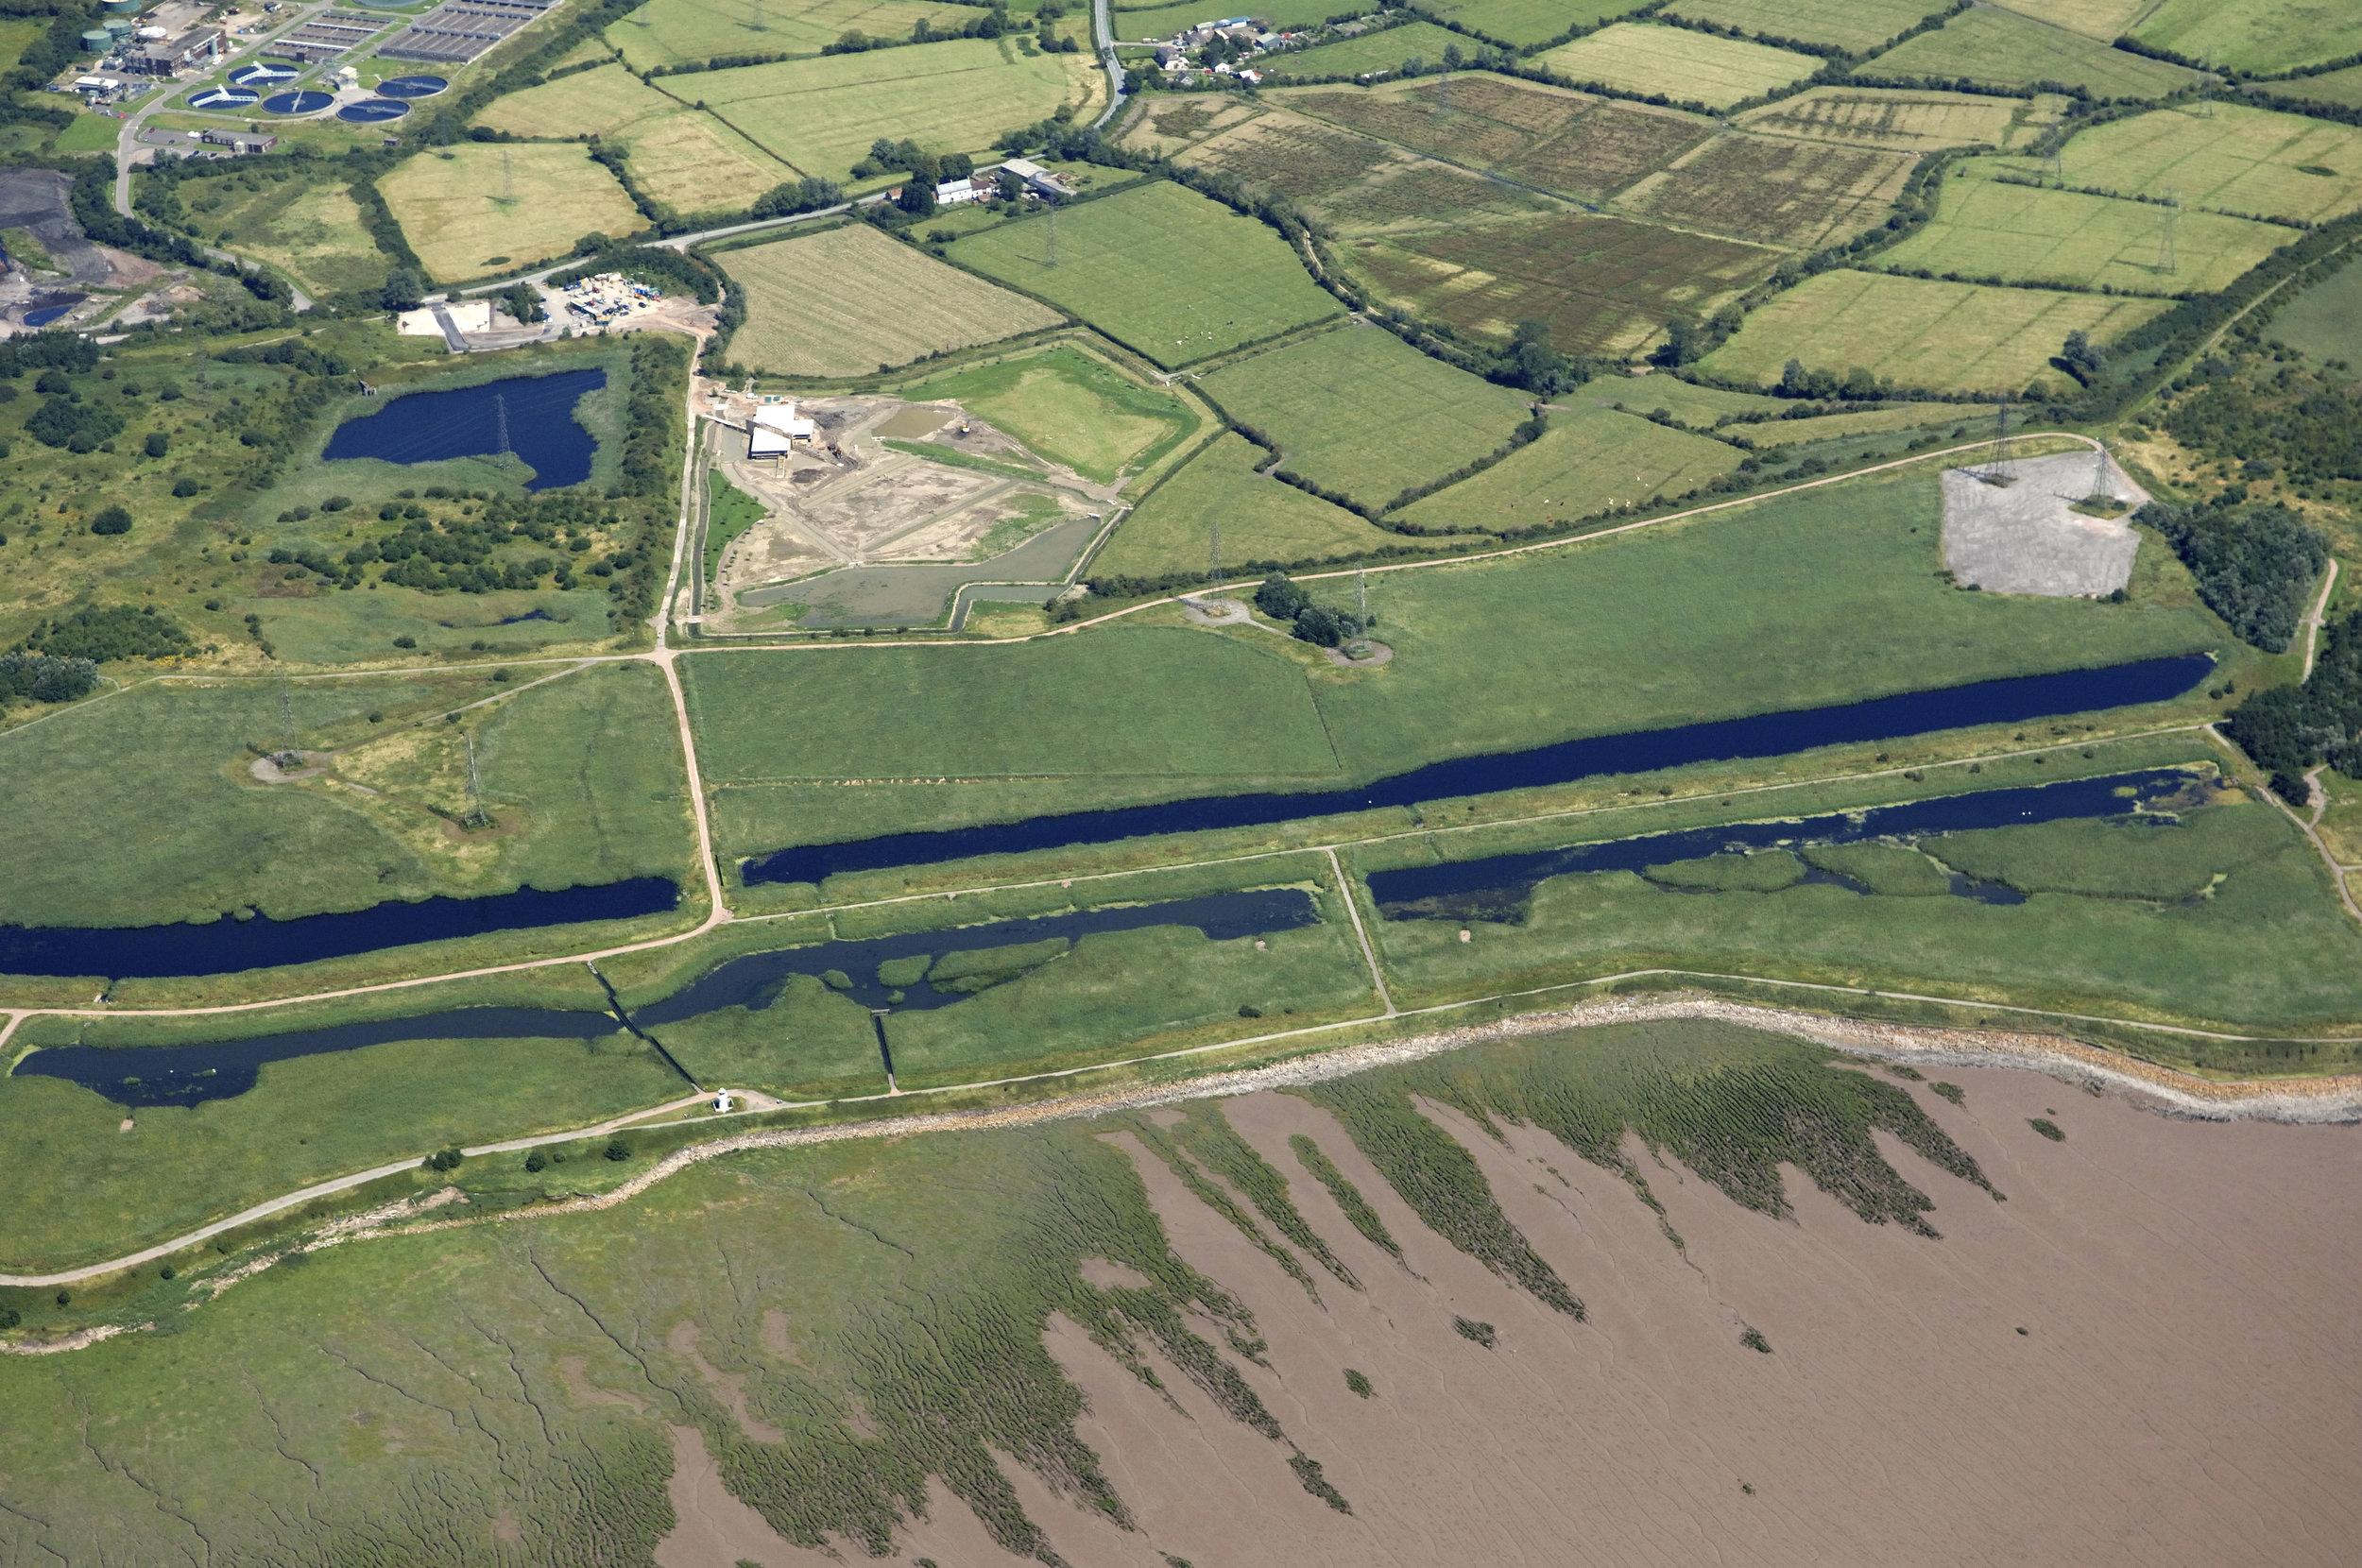 Newport Wetlands (RSPB images)